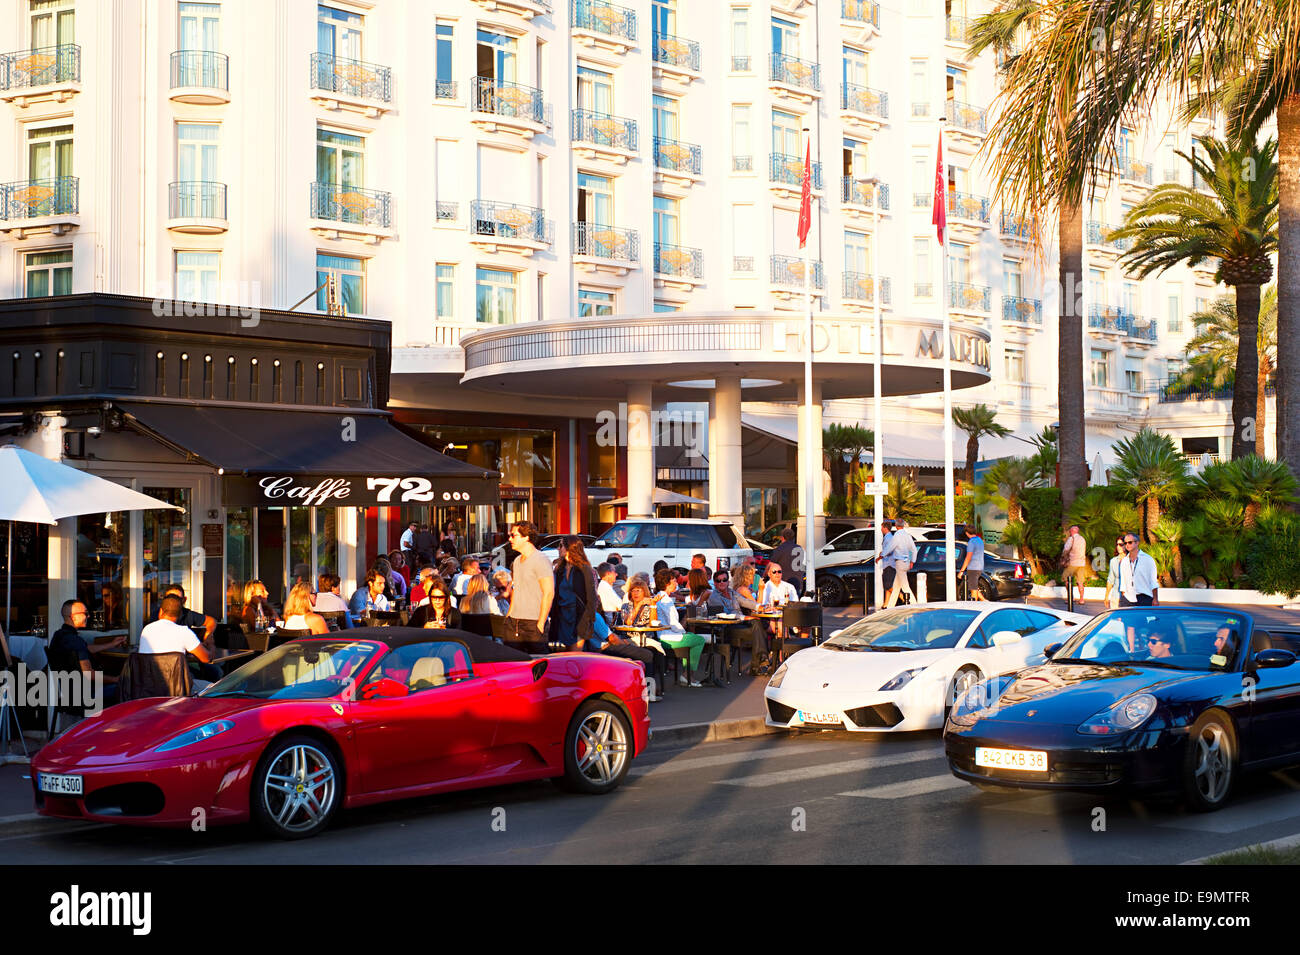 Luxuru Cannes - Stock Image